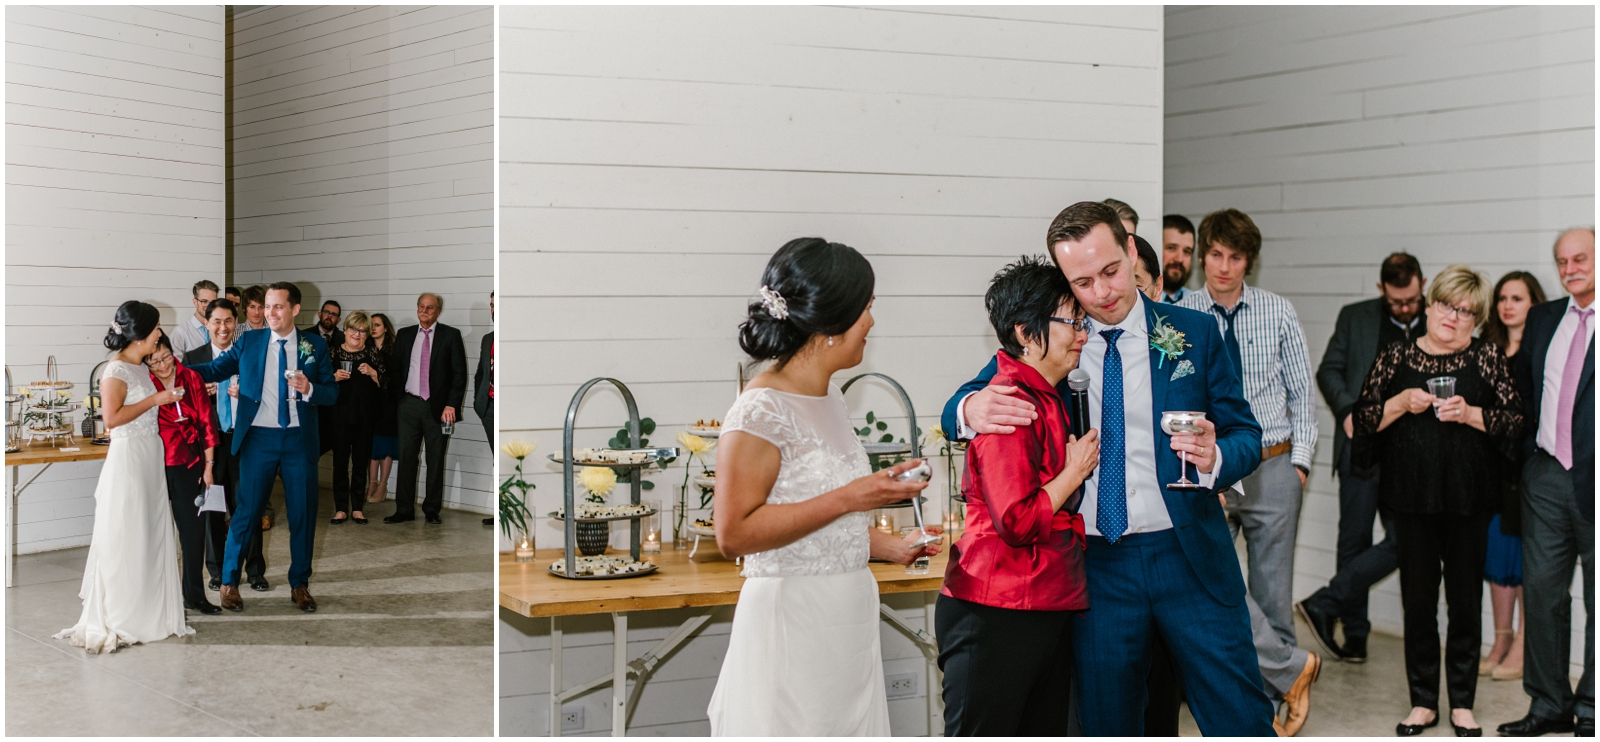 Minimalistic TX Venue Prosper House -Austin Wedding Planner_0370.jpg